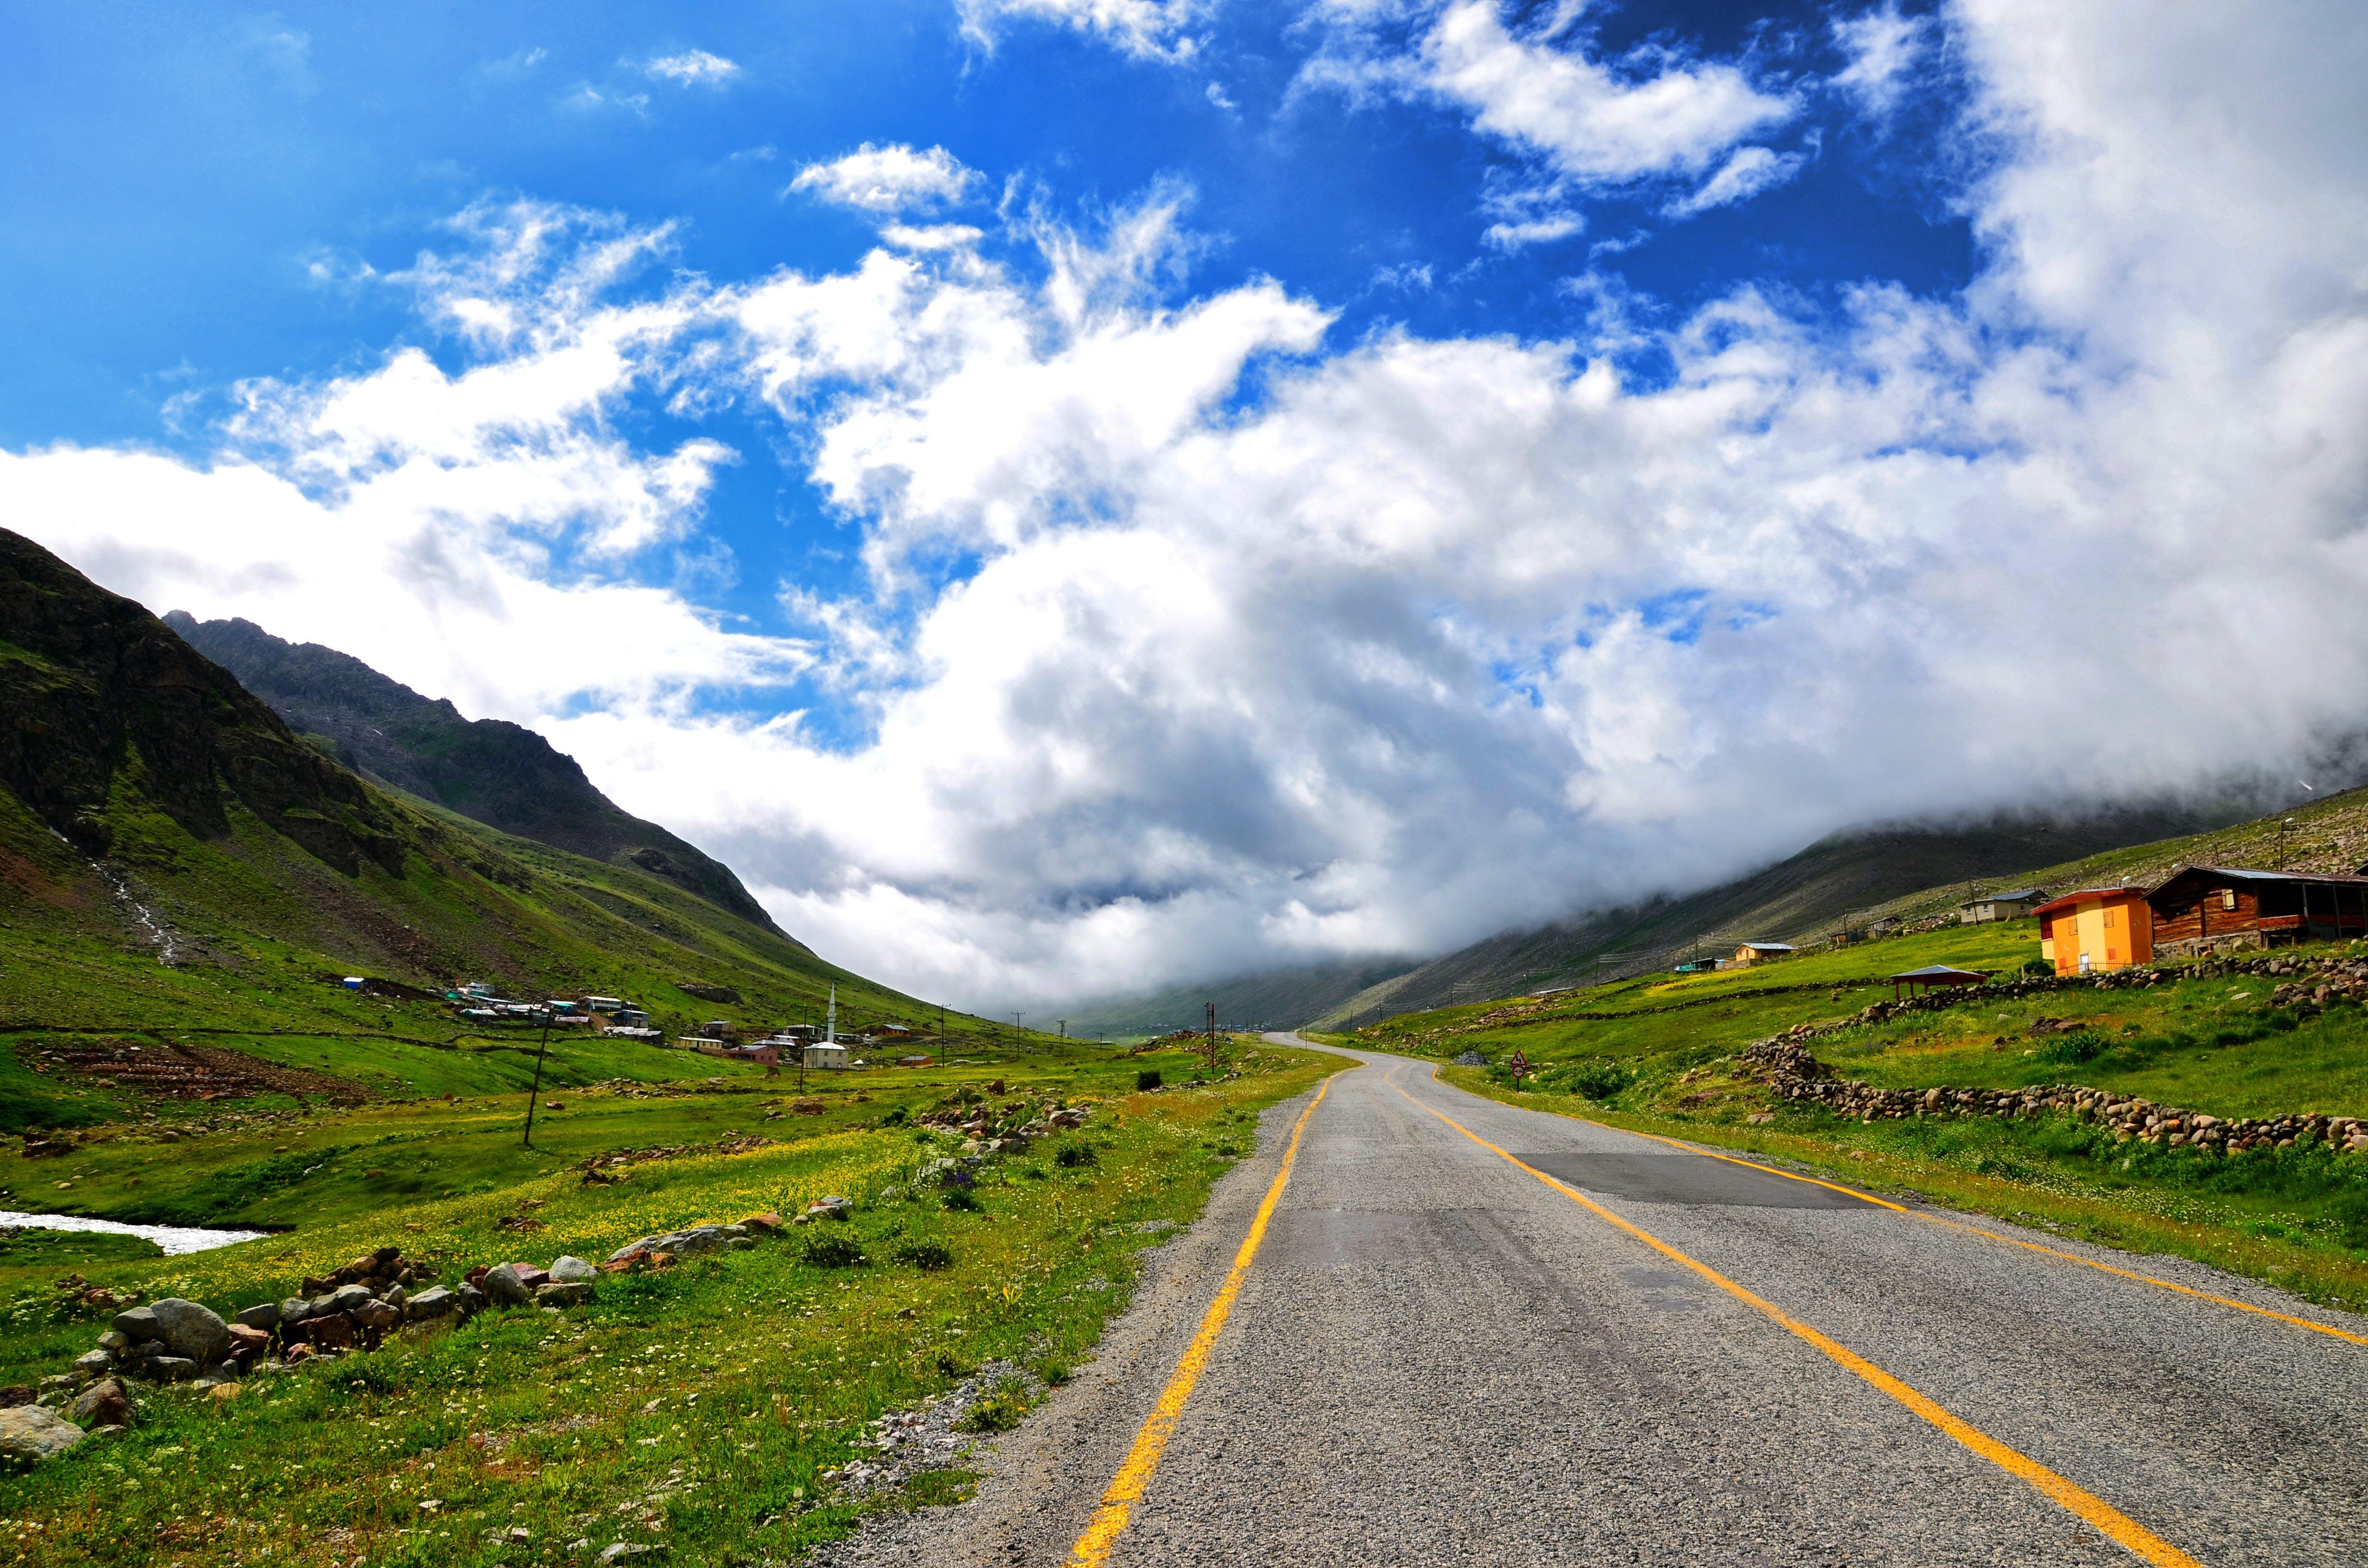 Road in Between of Green Grass